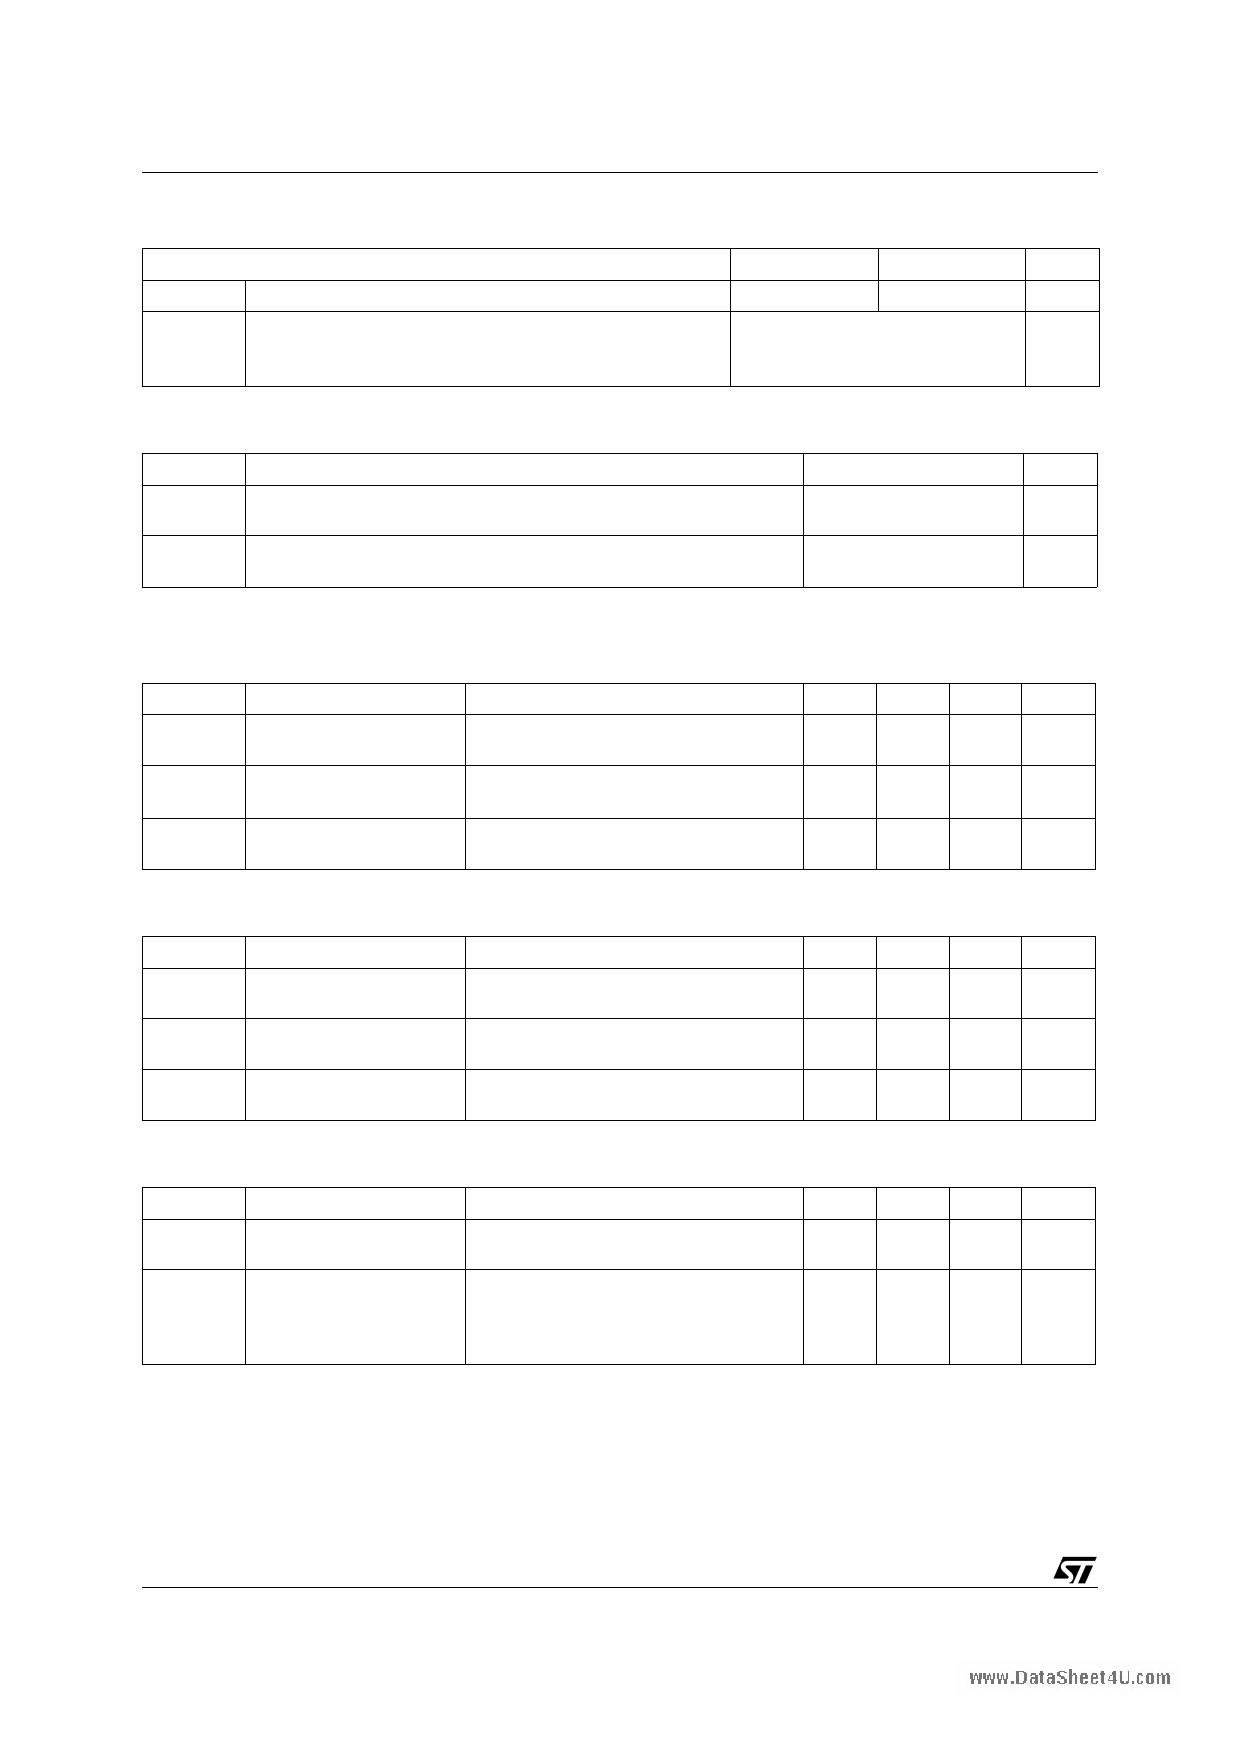 P3NB80 pdf, schematic